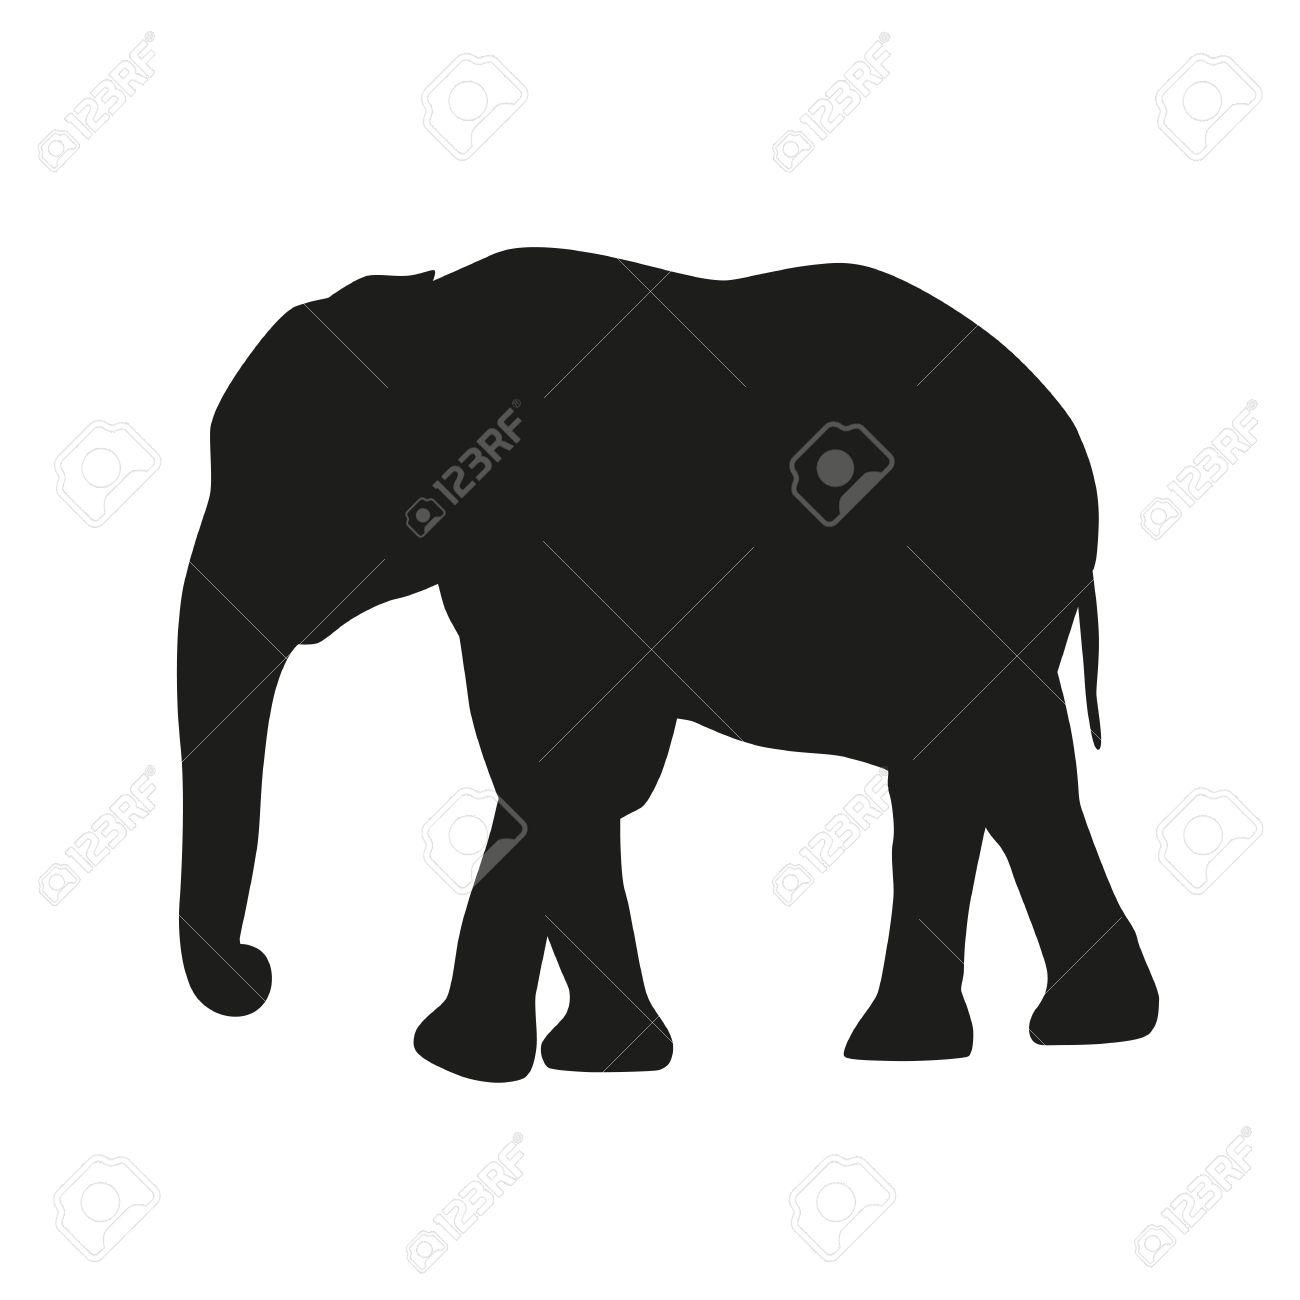 isolated elephant vector silhouette royalty free cliparts vectors rh 123rf com elephant vector free download elephant vector art